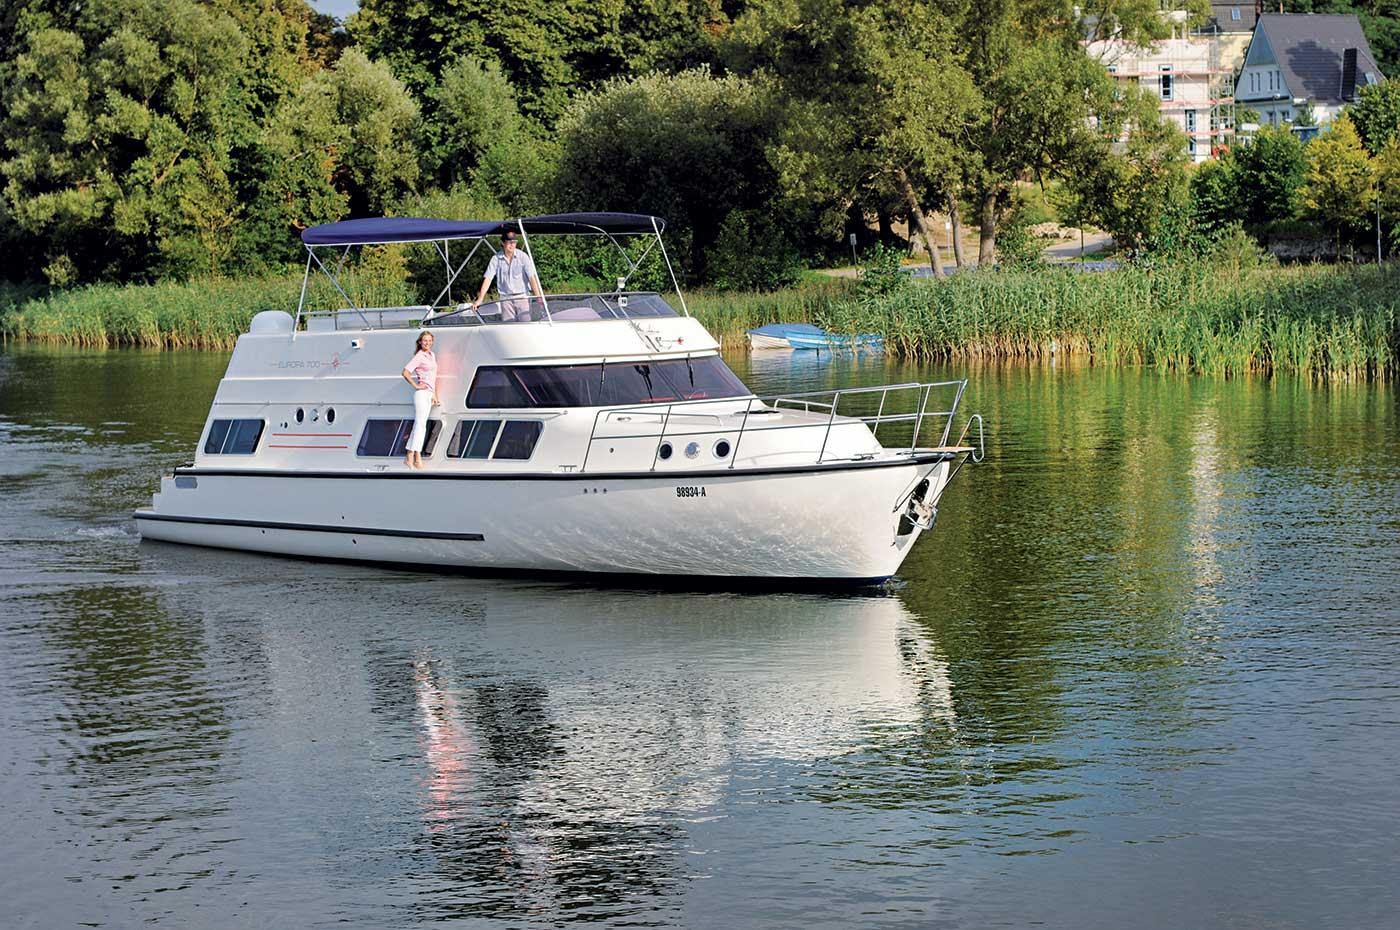 location bateau europa 700 pour navigation fluviale locaboat. Black Bedroom Furniture Sets. Home Design Ideas